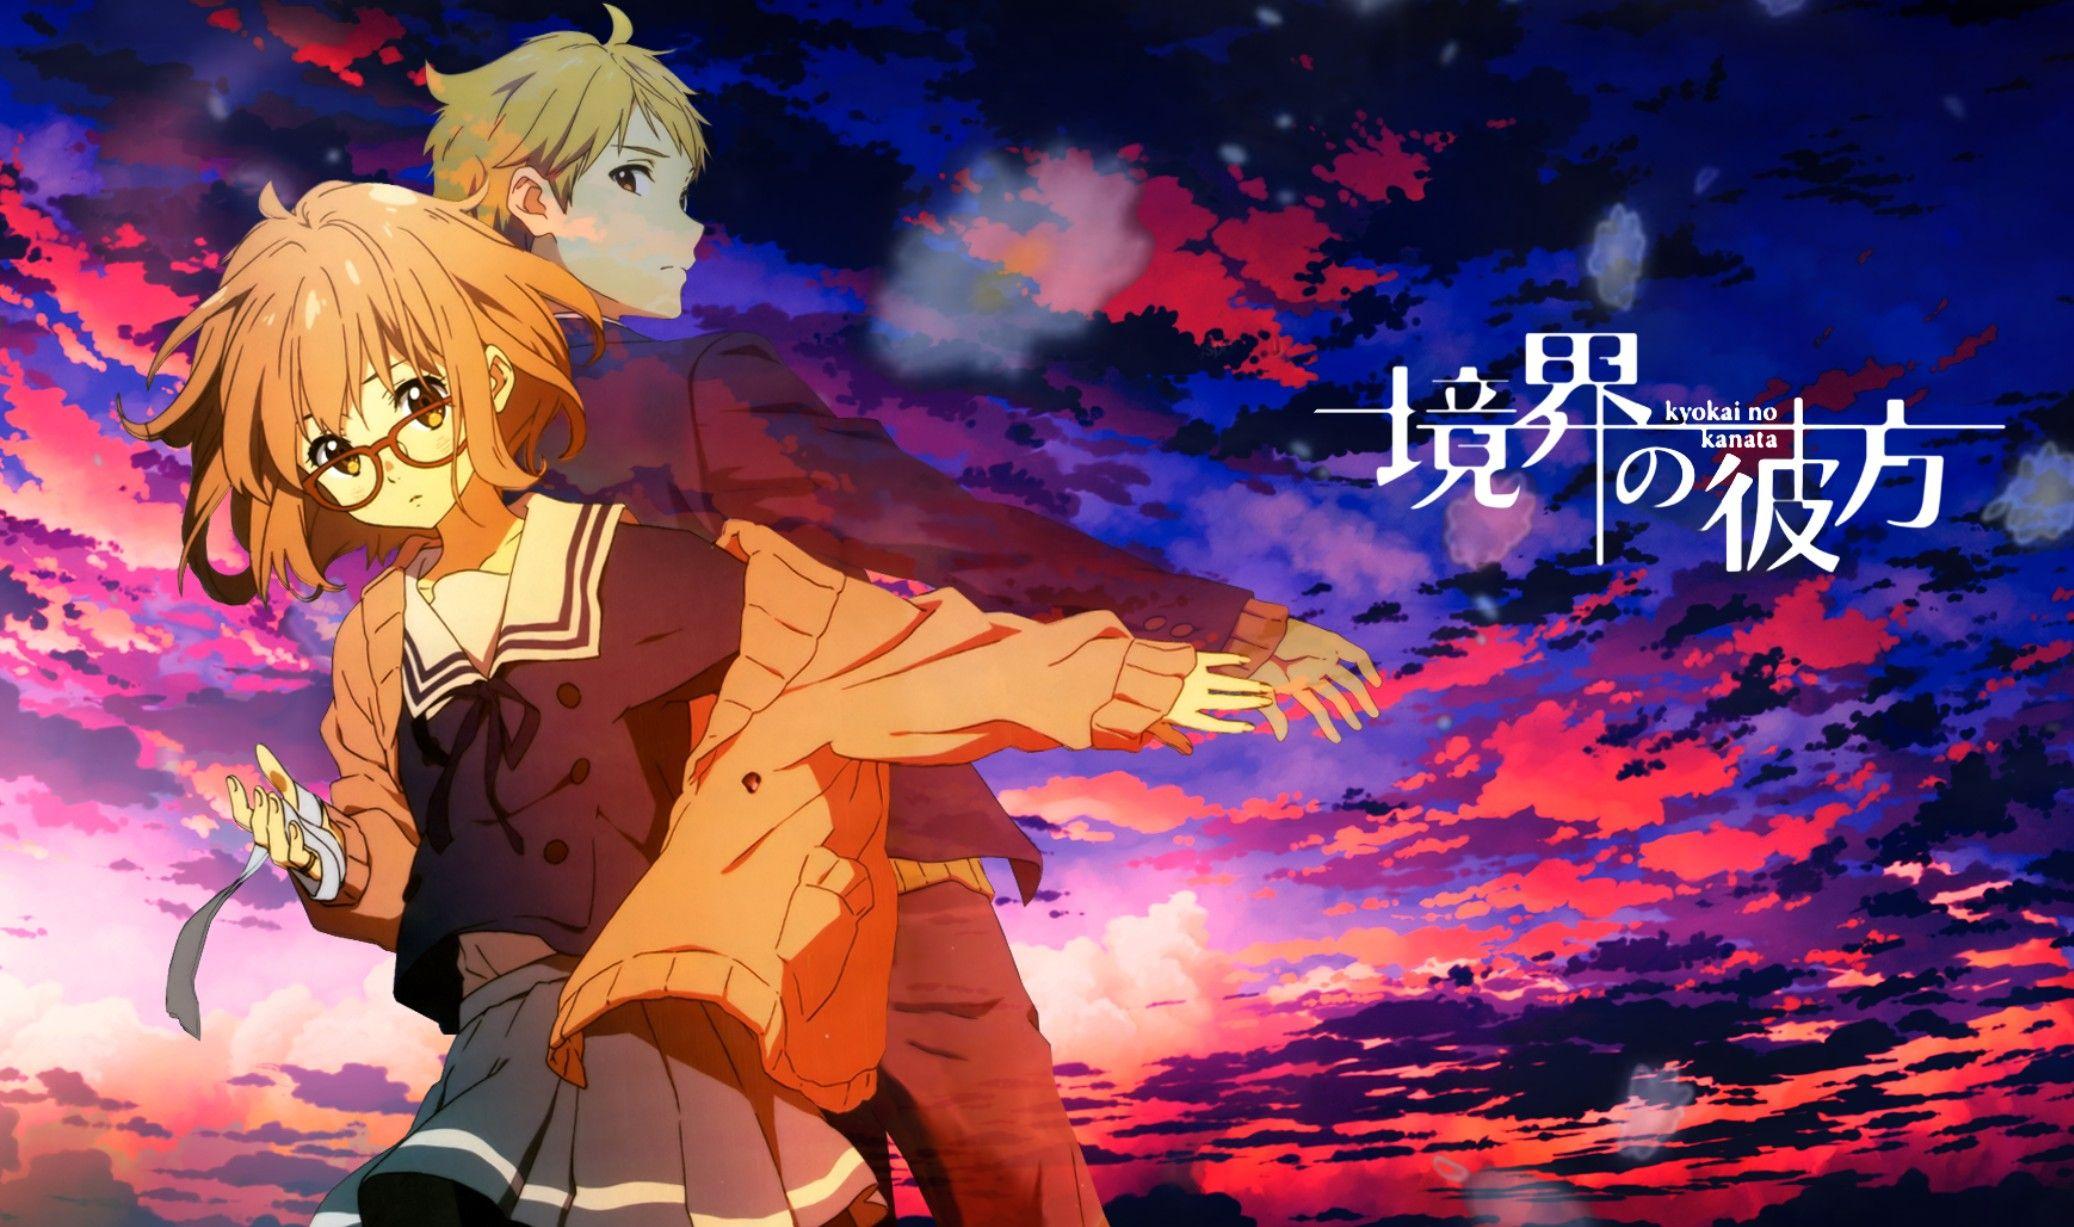 Kyokai No Kanata (With images) Good anime series, Anime